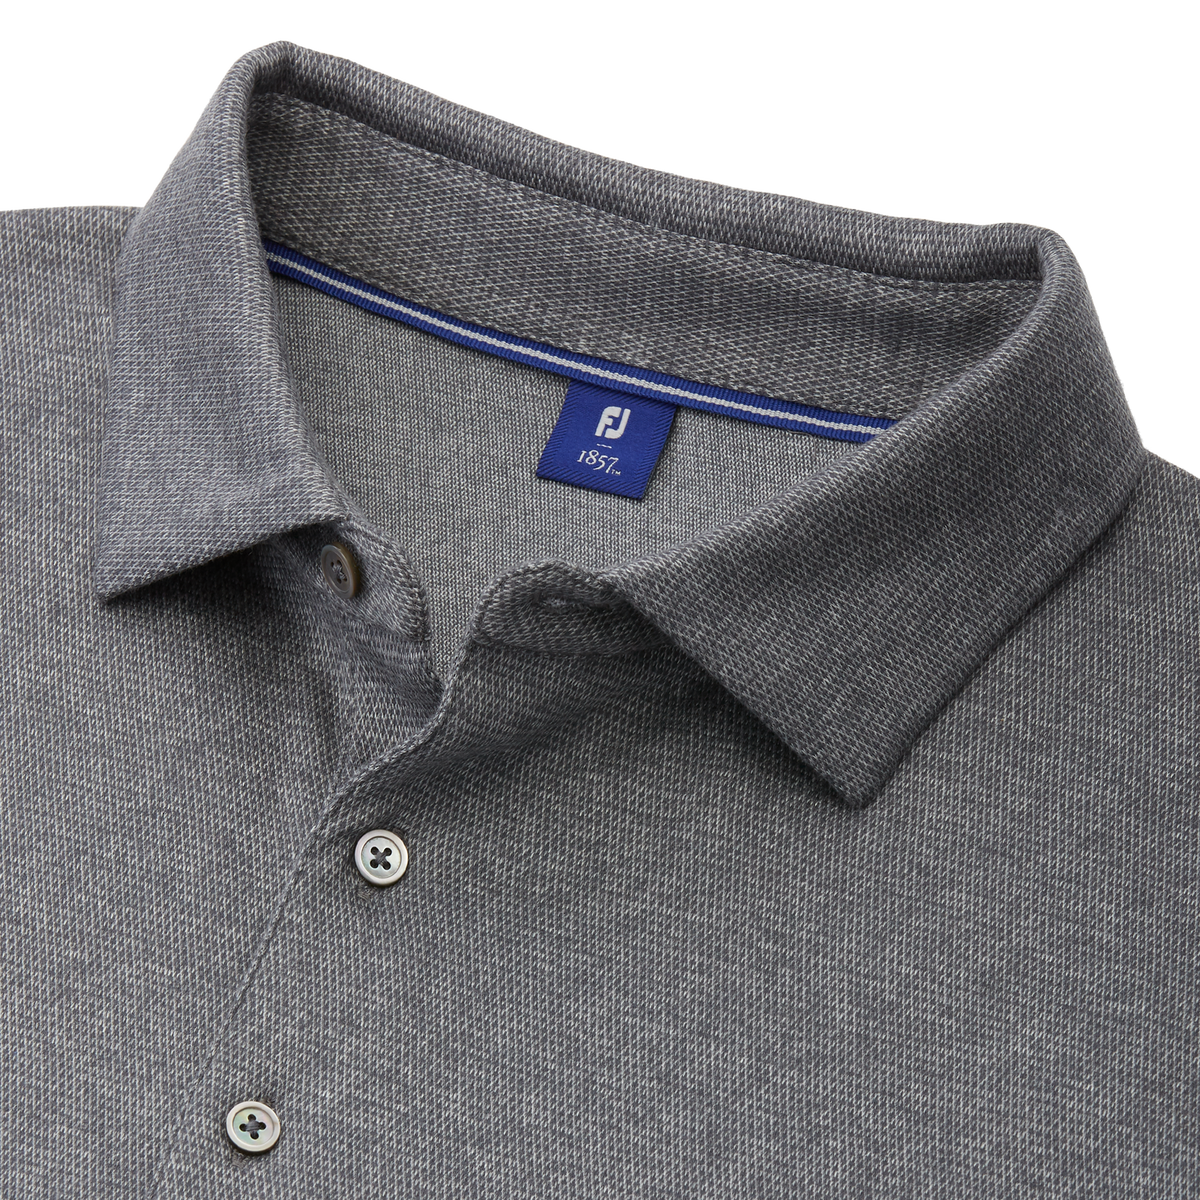 Diamond Jacquard Knit Shirt-Previous Season Style